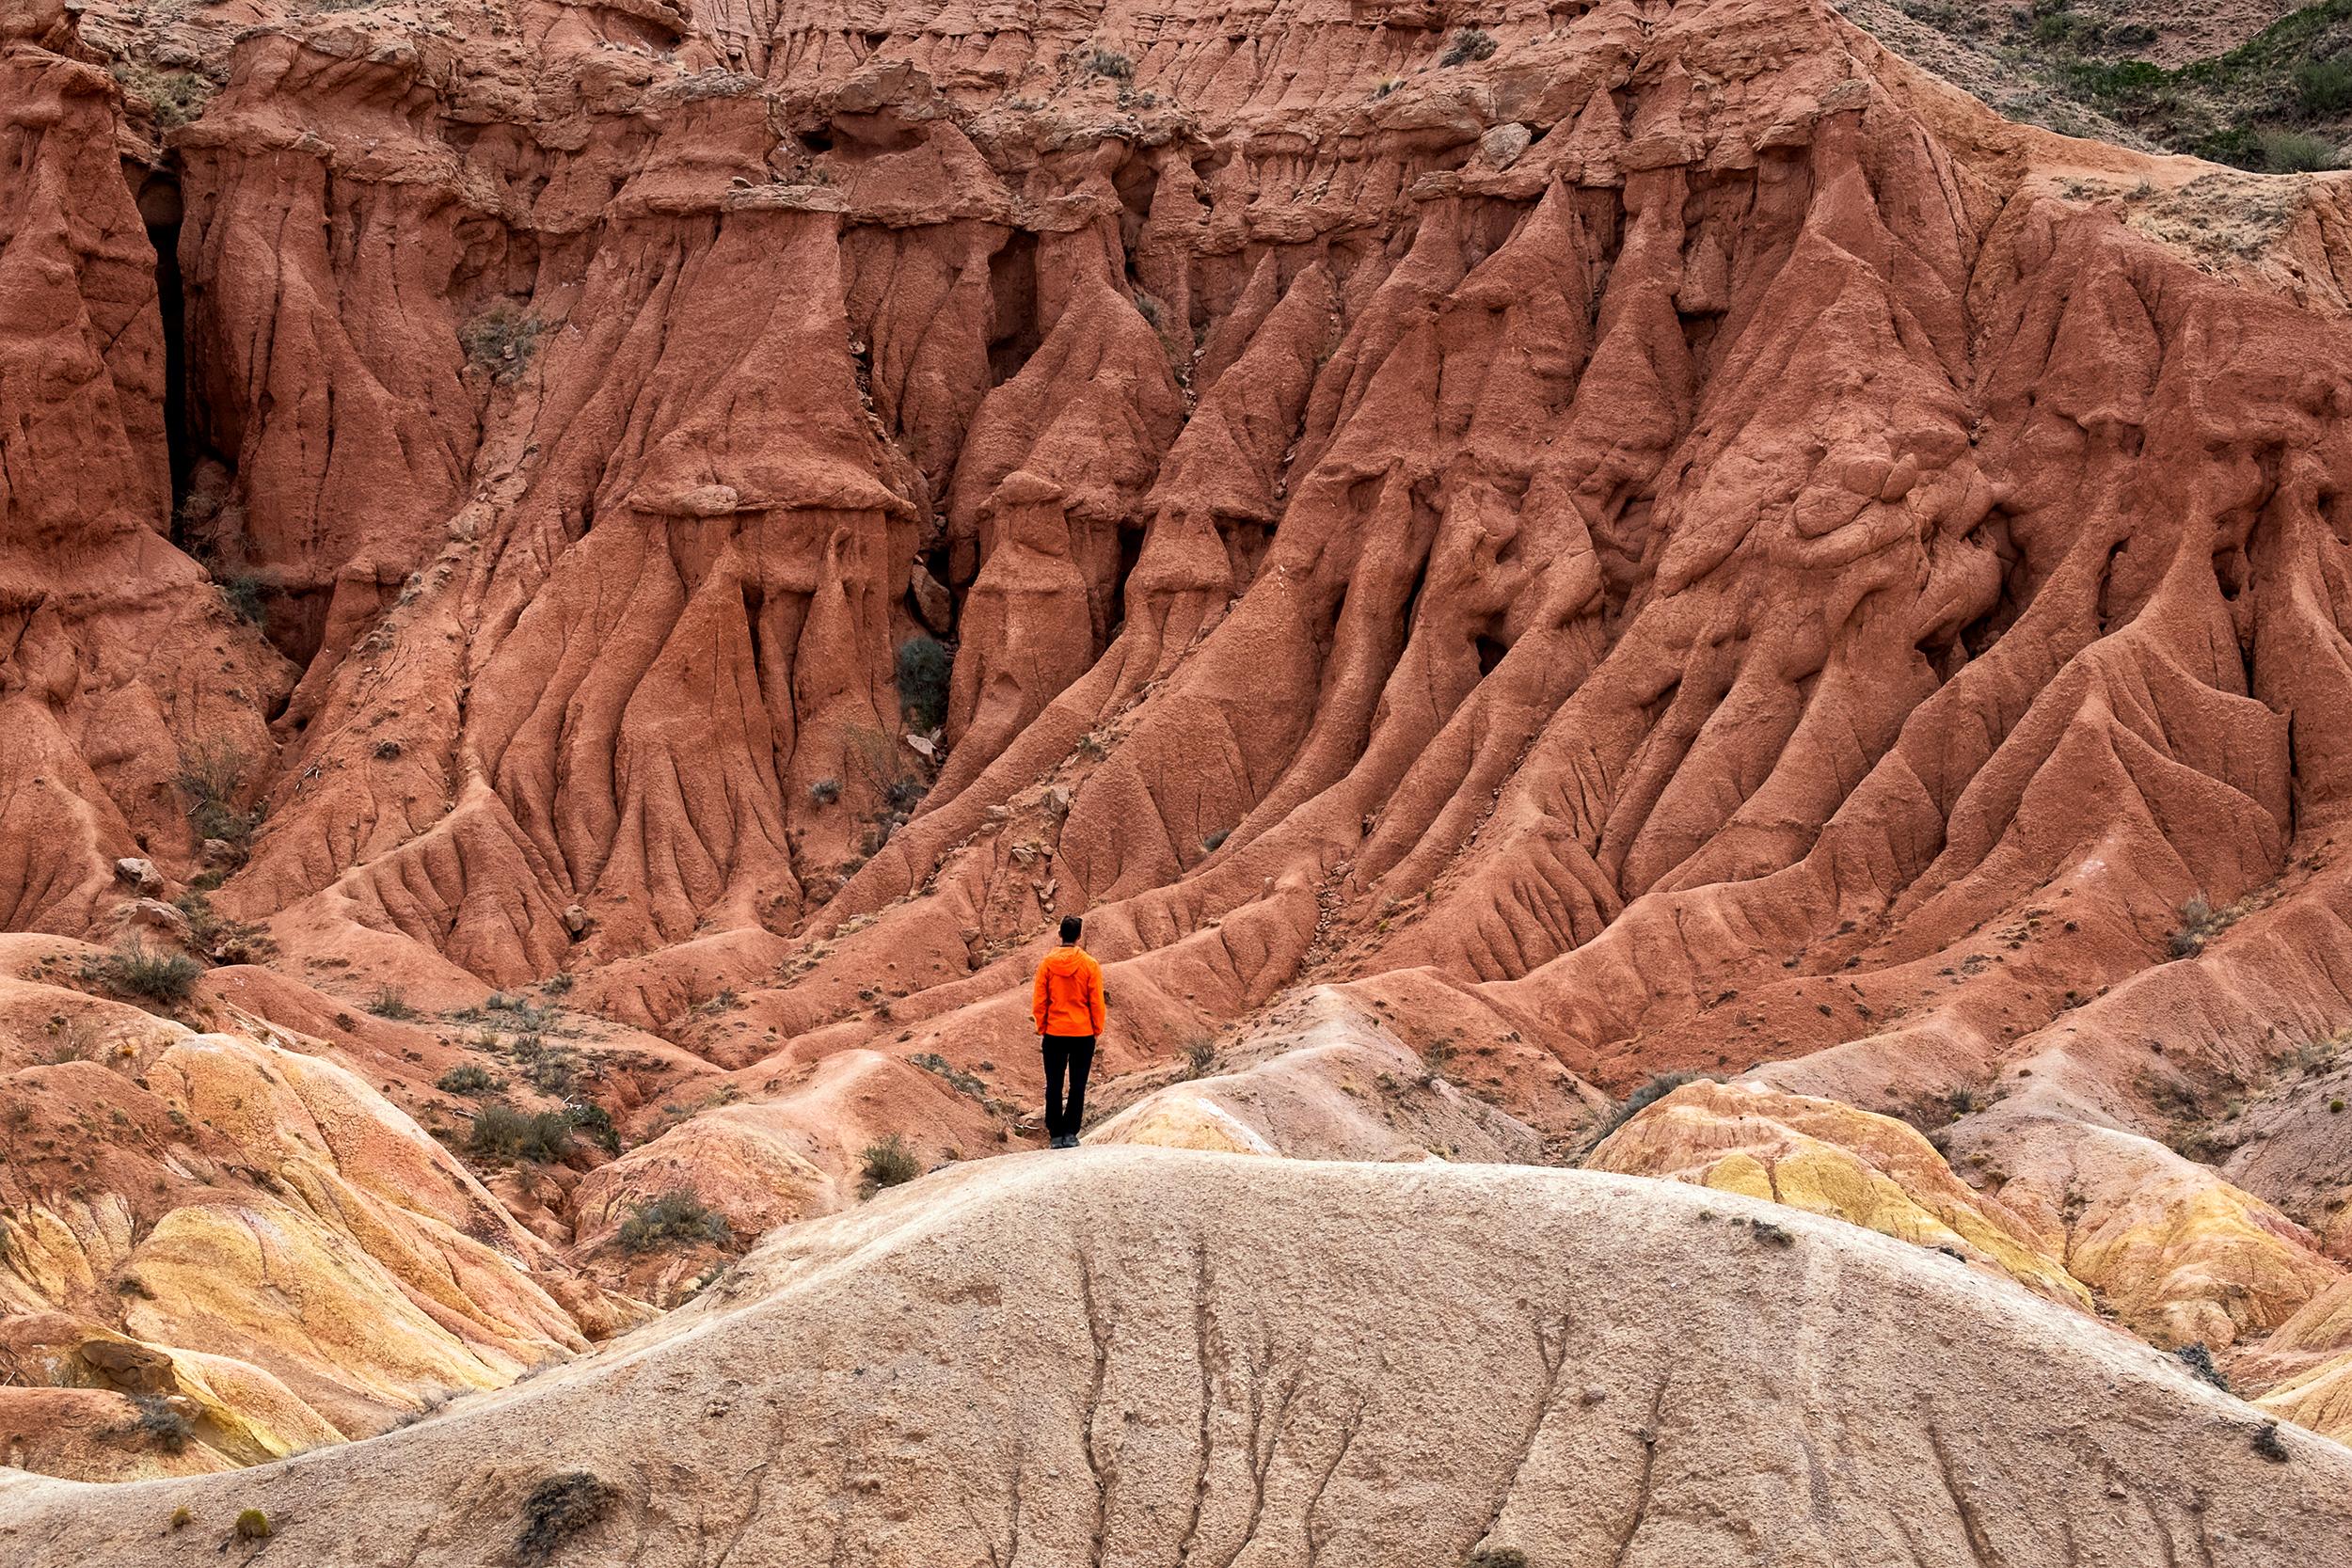 Photo:  Fujifilm X-T3 & Fujinon XF55-200mm Lens - Fairytale Canyon, Kyrgyzstan